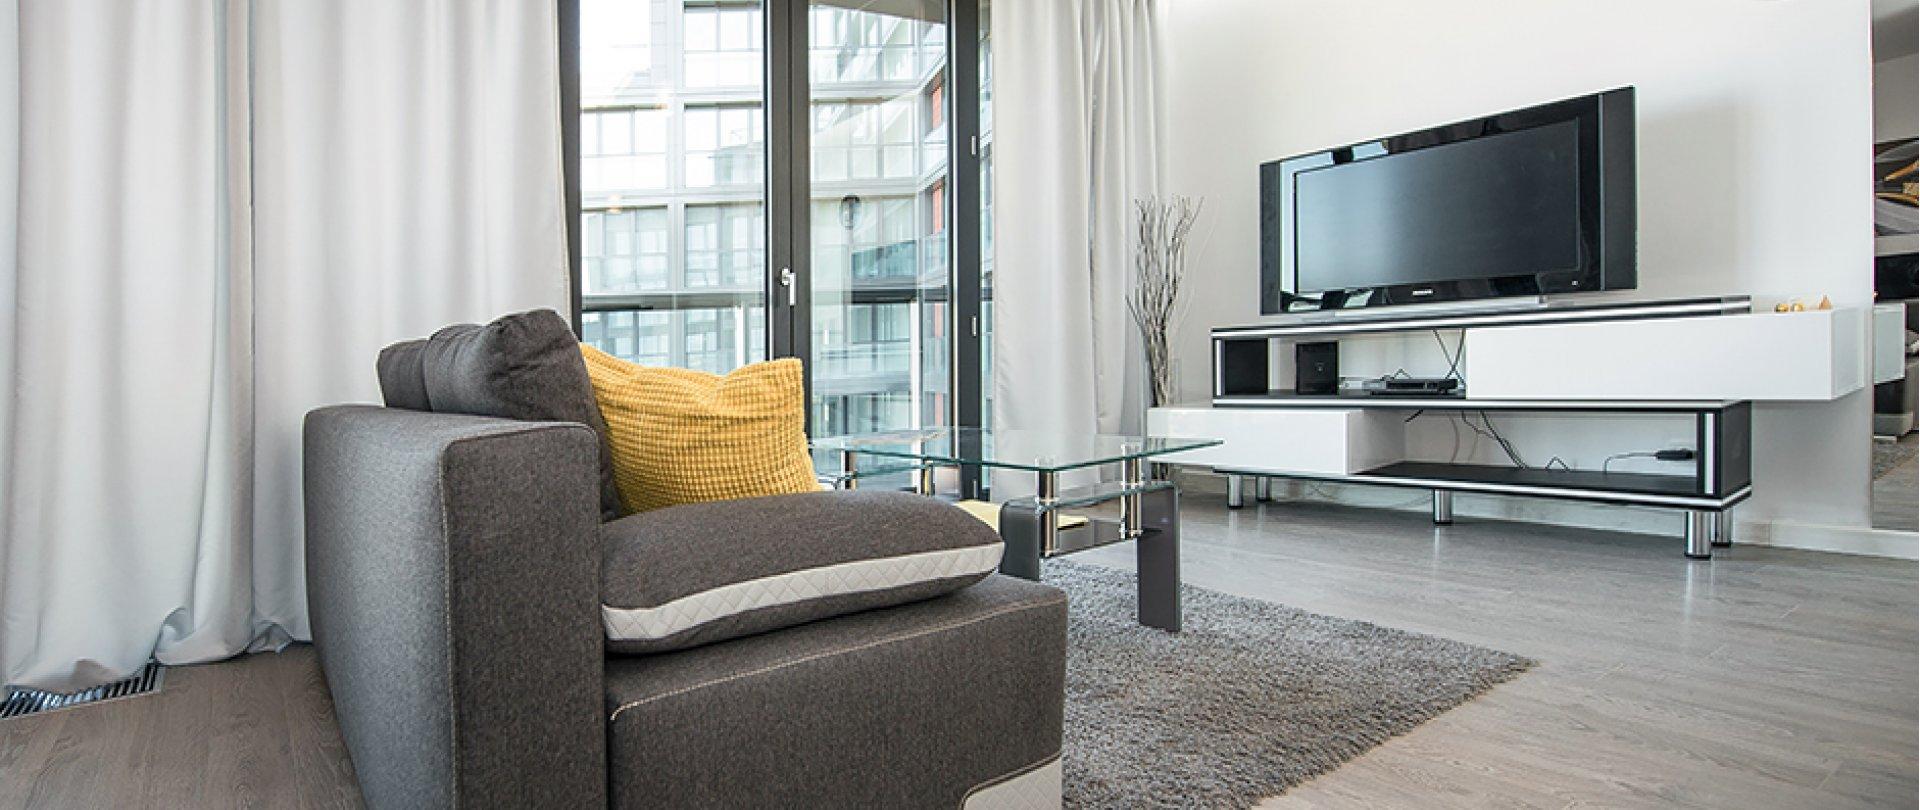 Nr 6. Apartament typu Studio 36m2